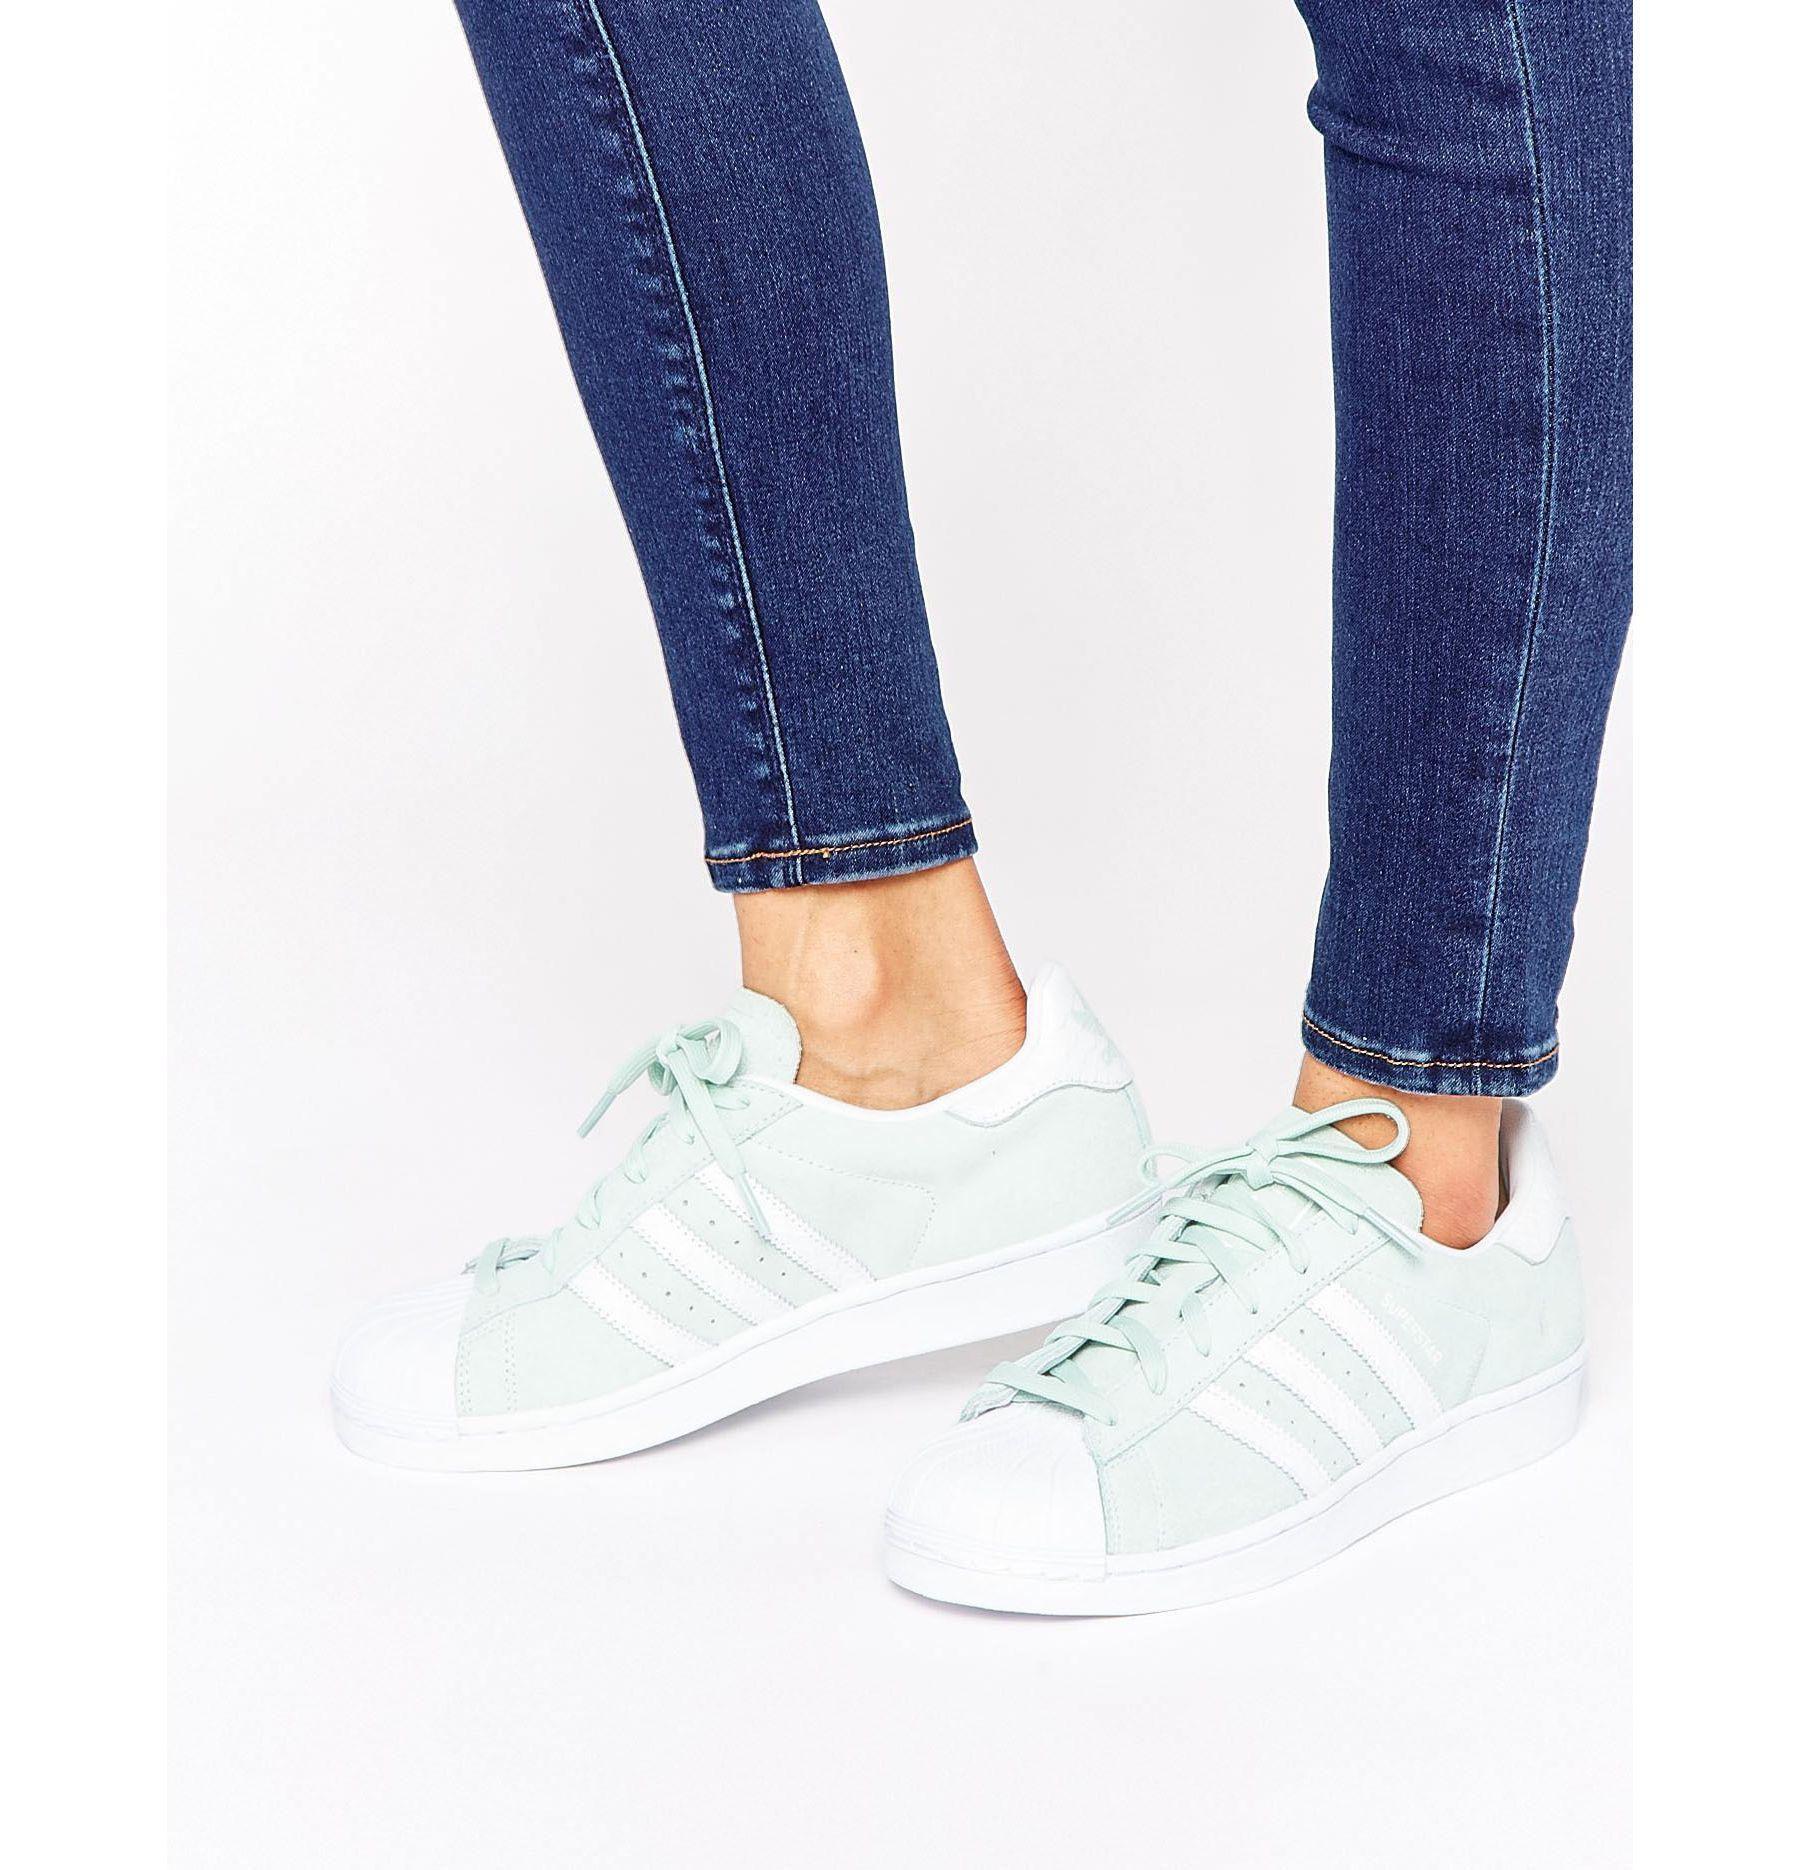 Cheap Adidas Men\u0027s Superstar 80s PK Originals Casual Shoe 12